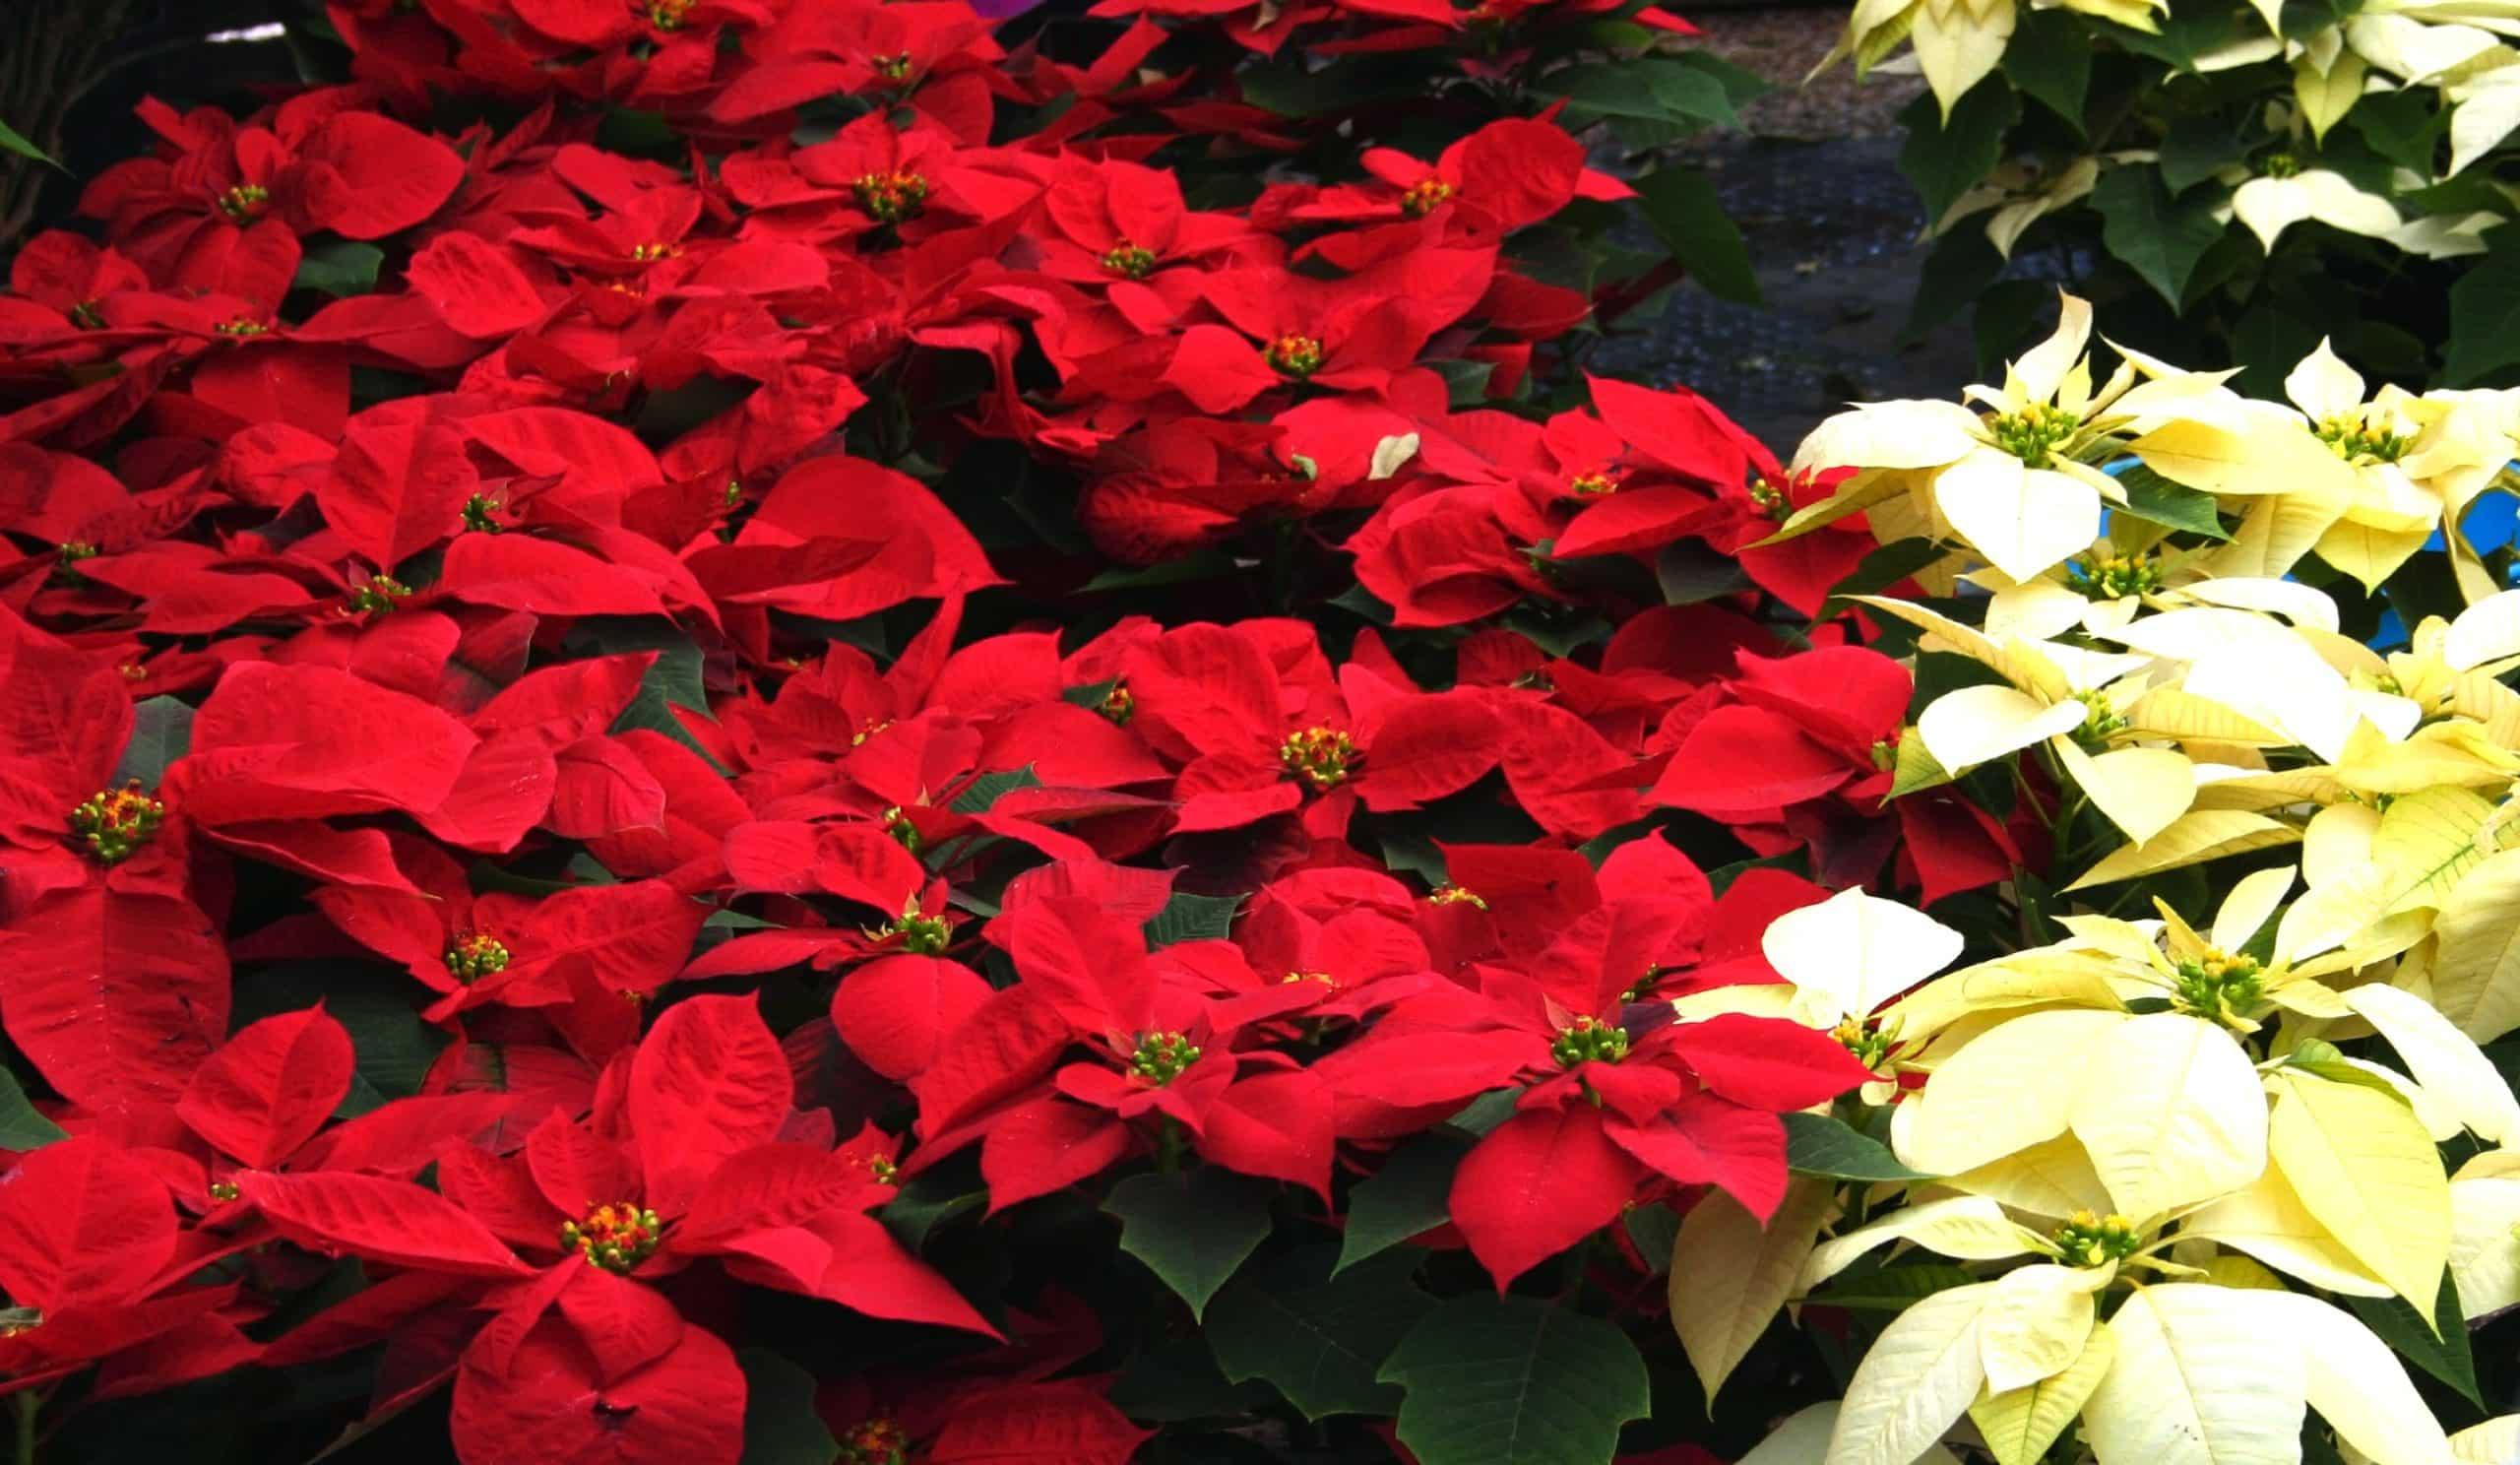 Poinsettias Sloat Garden Center